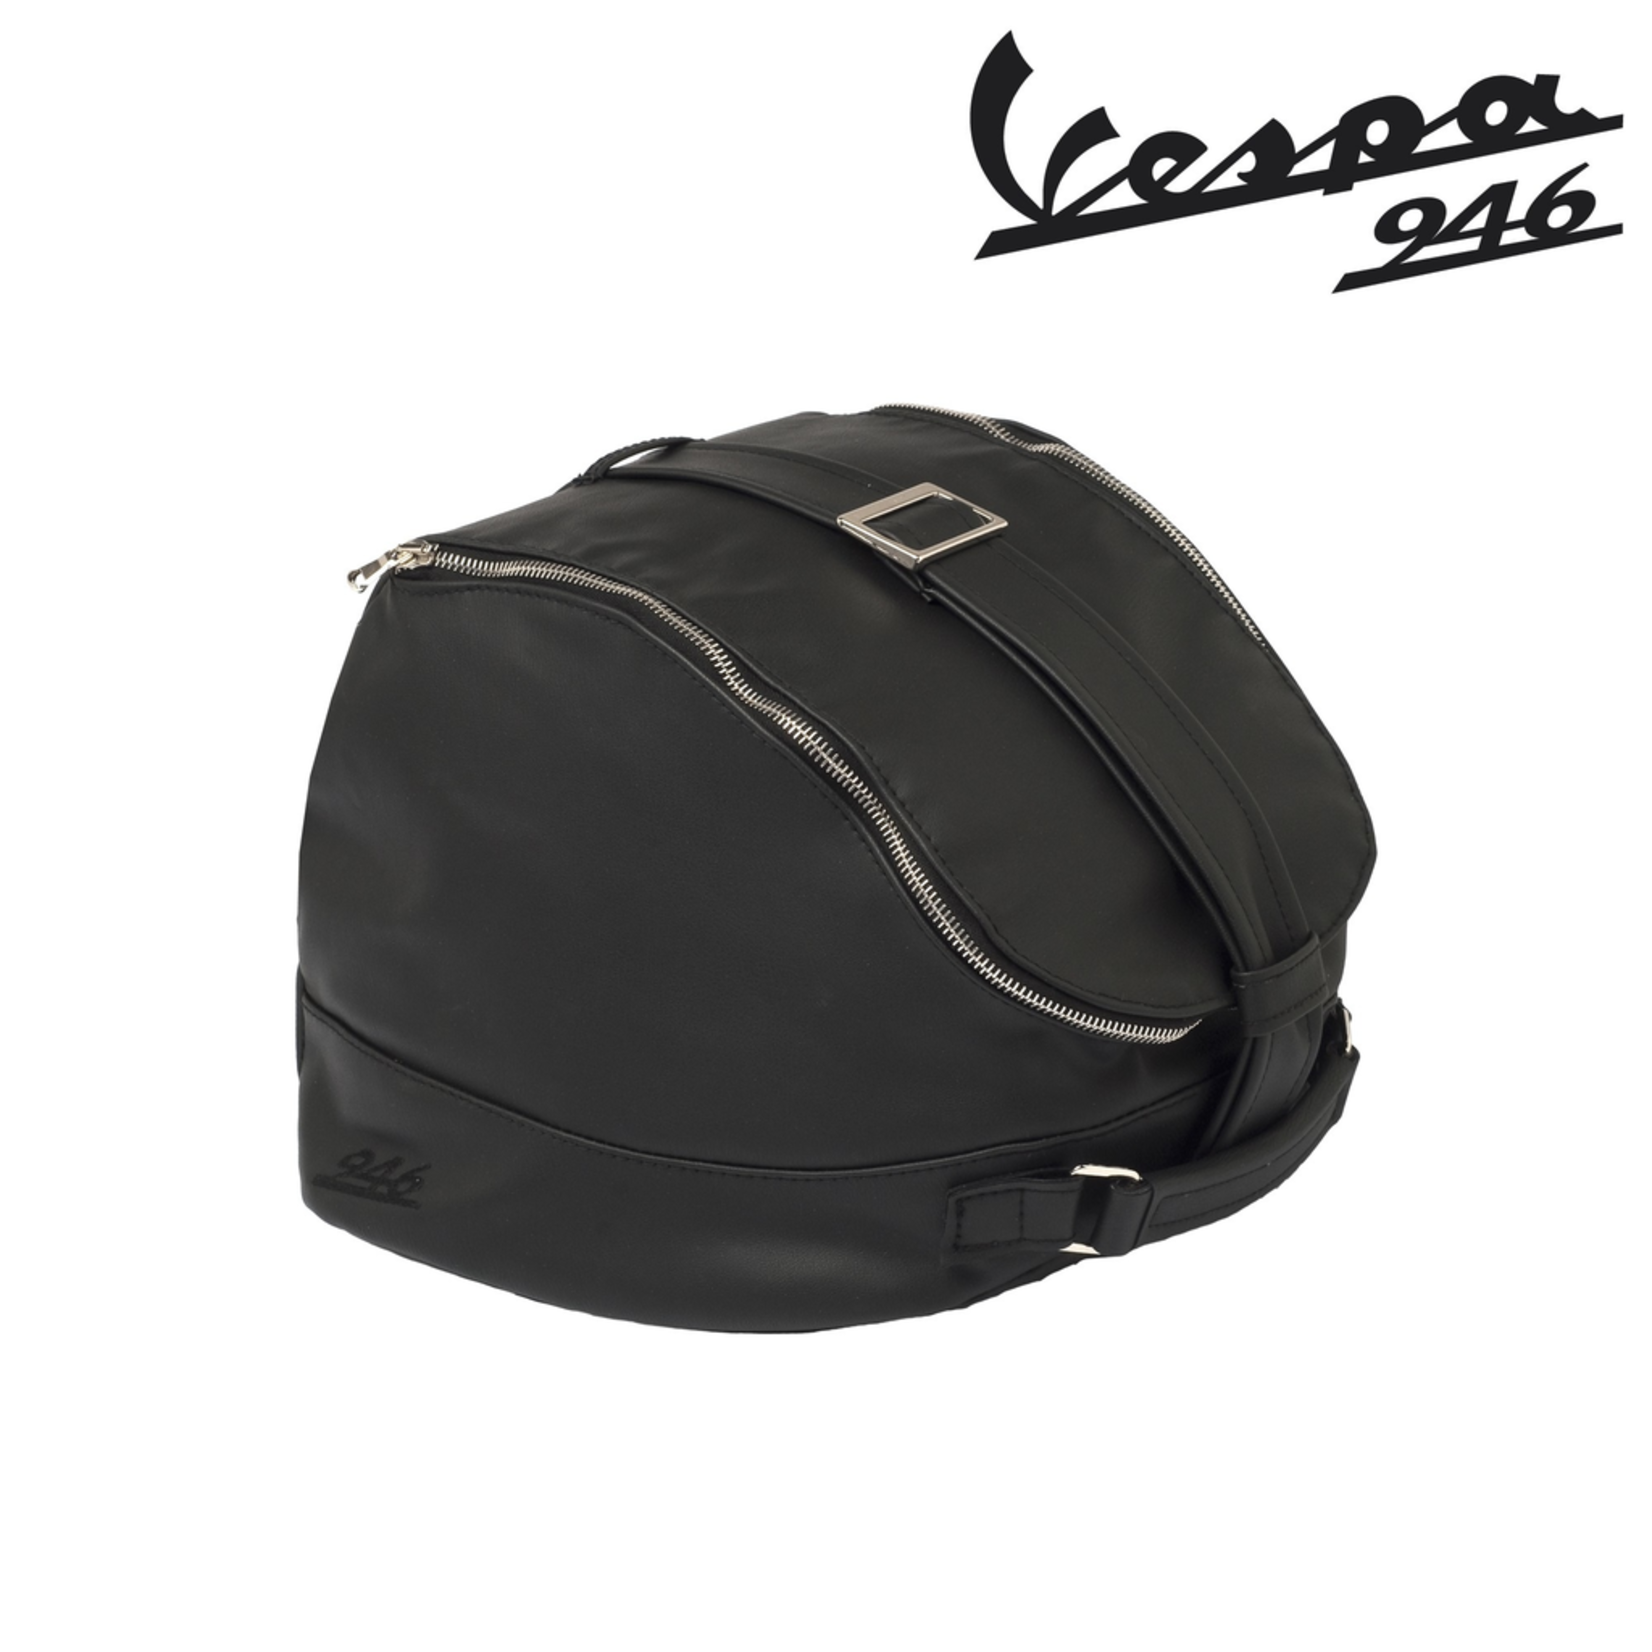 Accessories Helmet Bag, Vespa 946 Black Leather